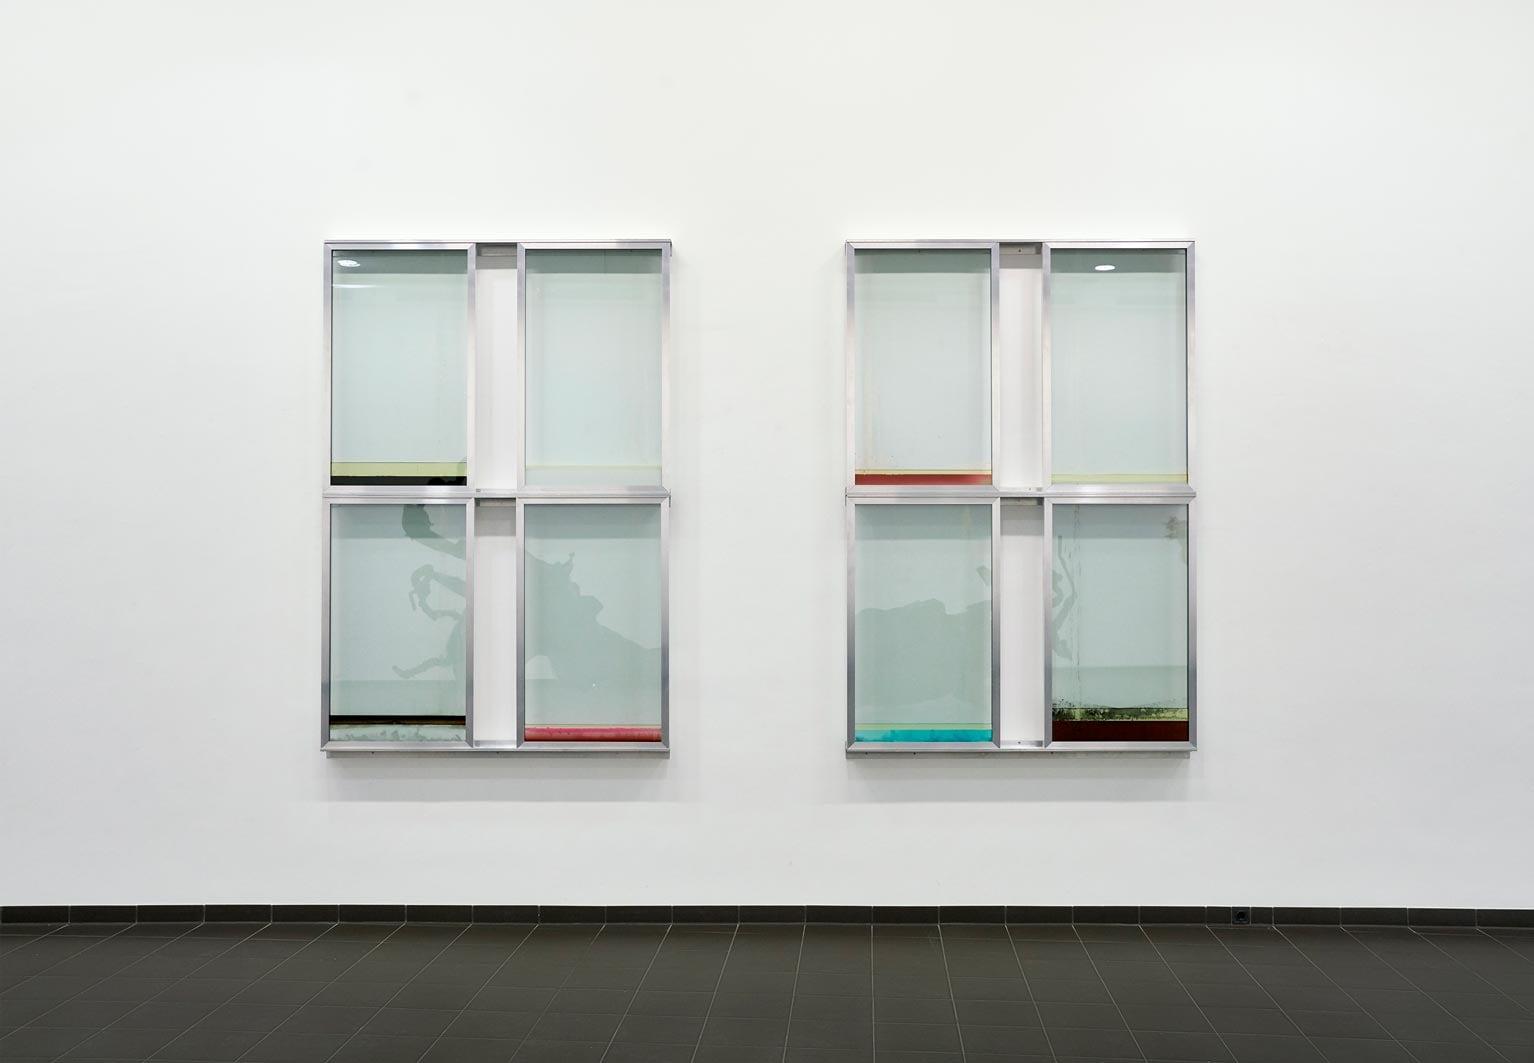 07-urban-hueter-window-i-therere-is-no-place-like-home-2019-aluminium-glas-flüssigkeiten-400-x-260-x-13-cm